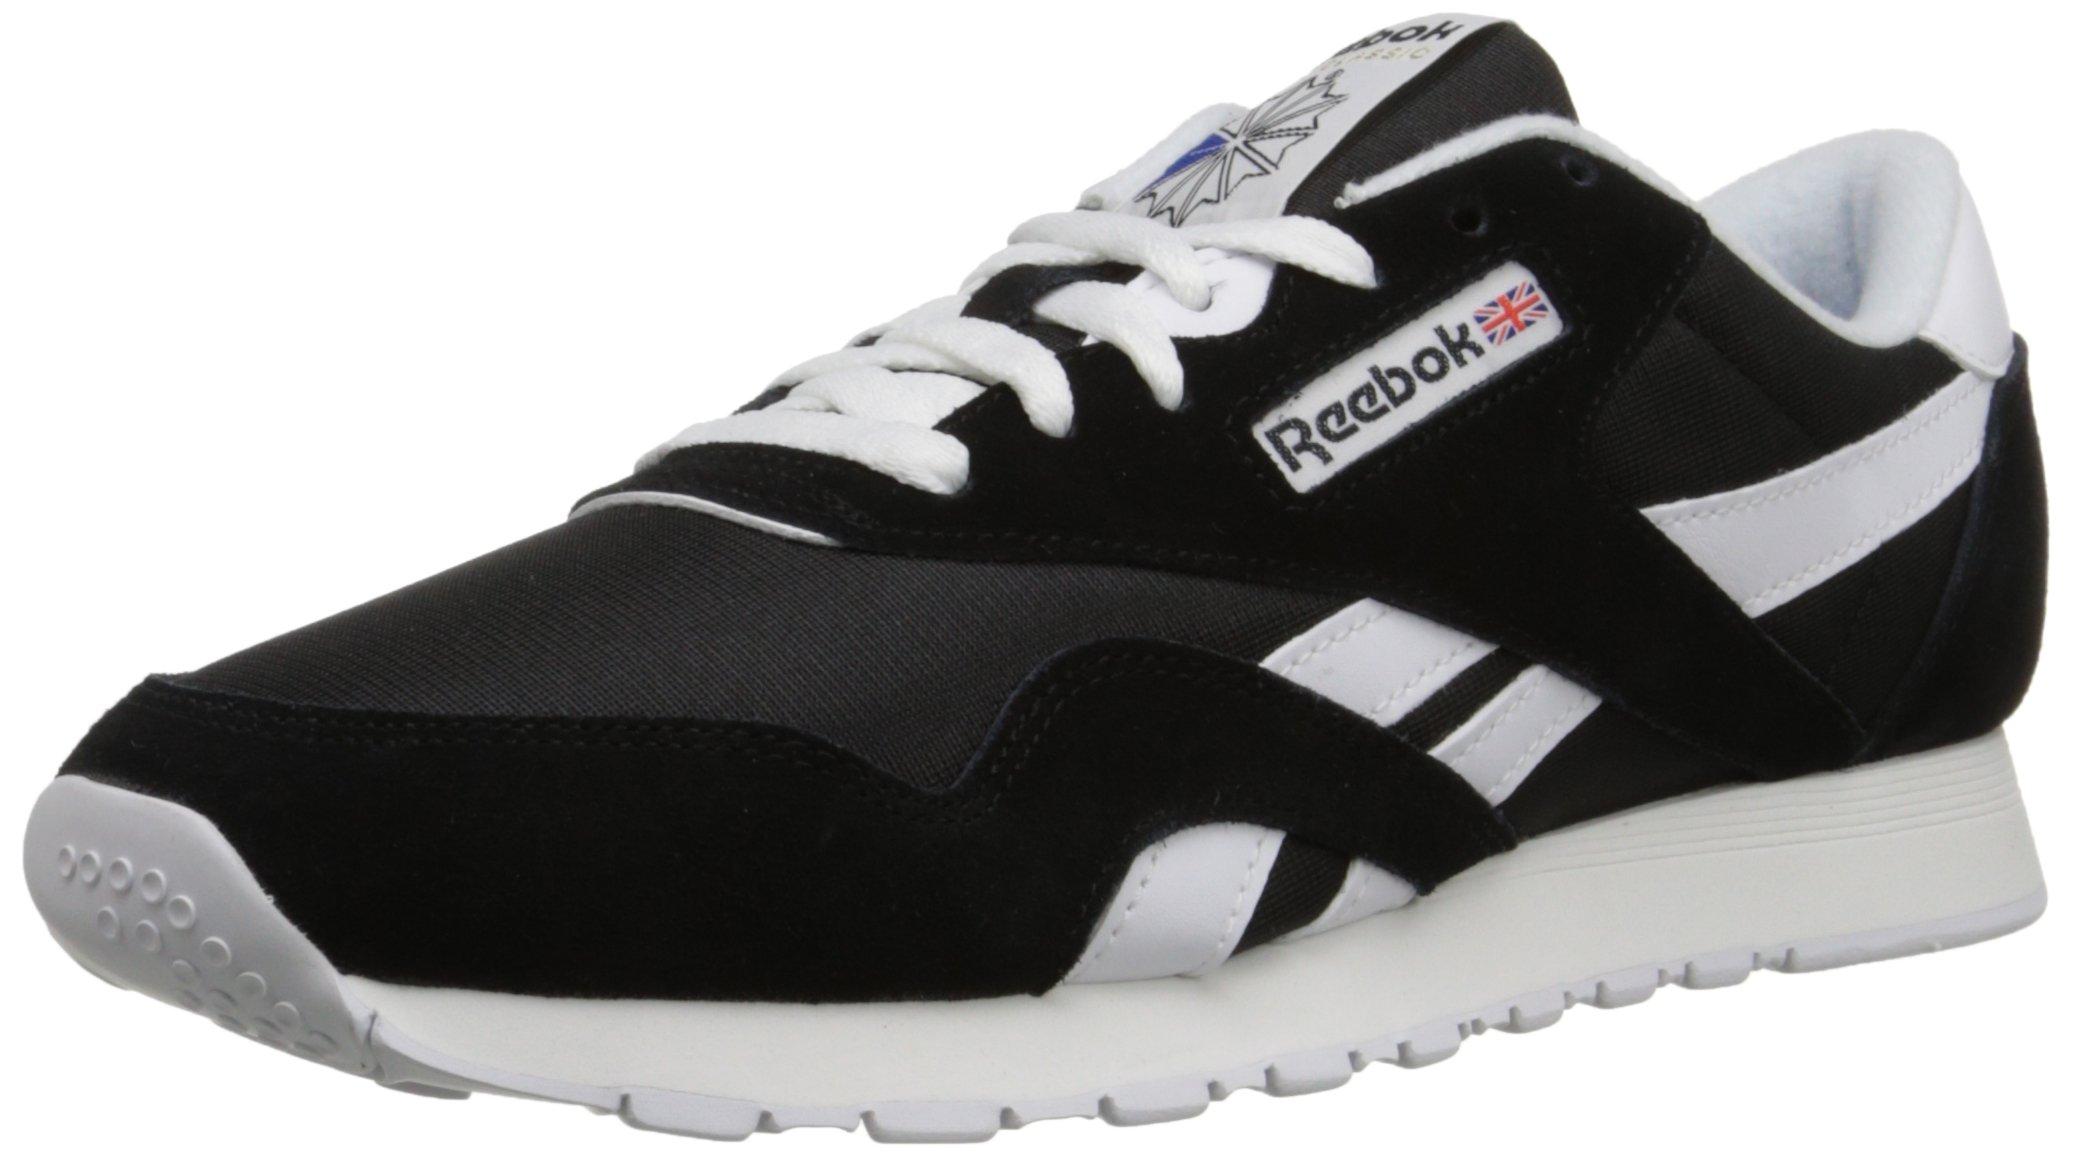 Reebok Men's Classic Sneaker, Black/White, 9.5M